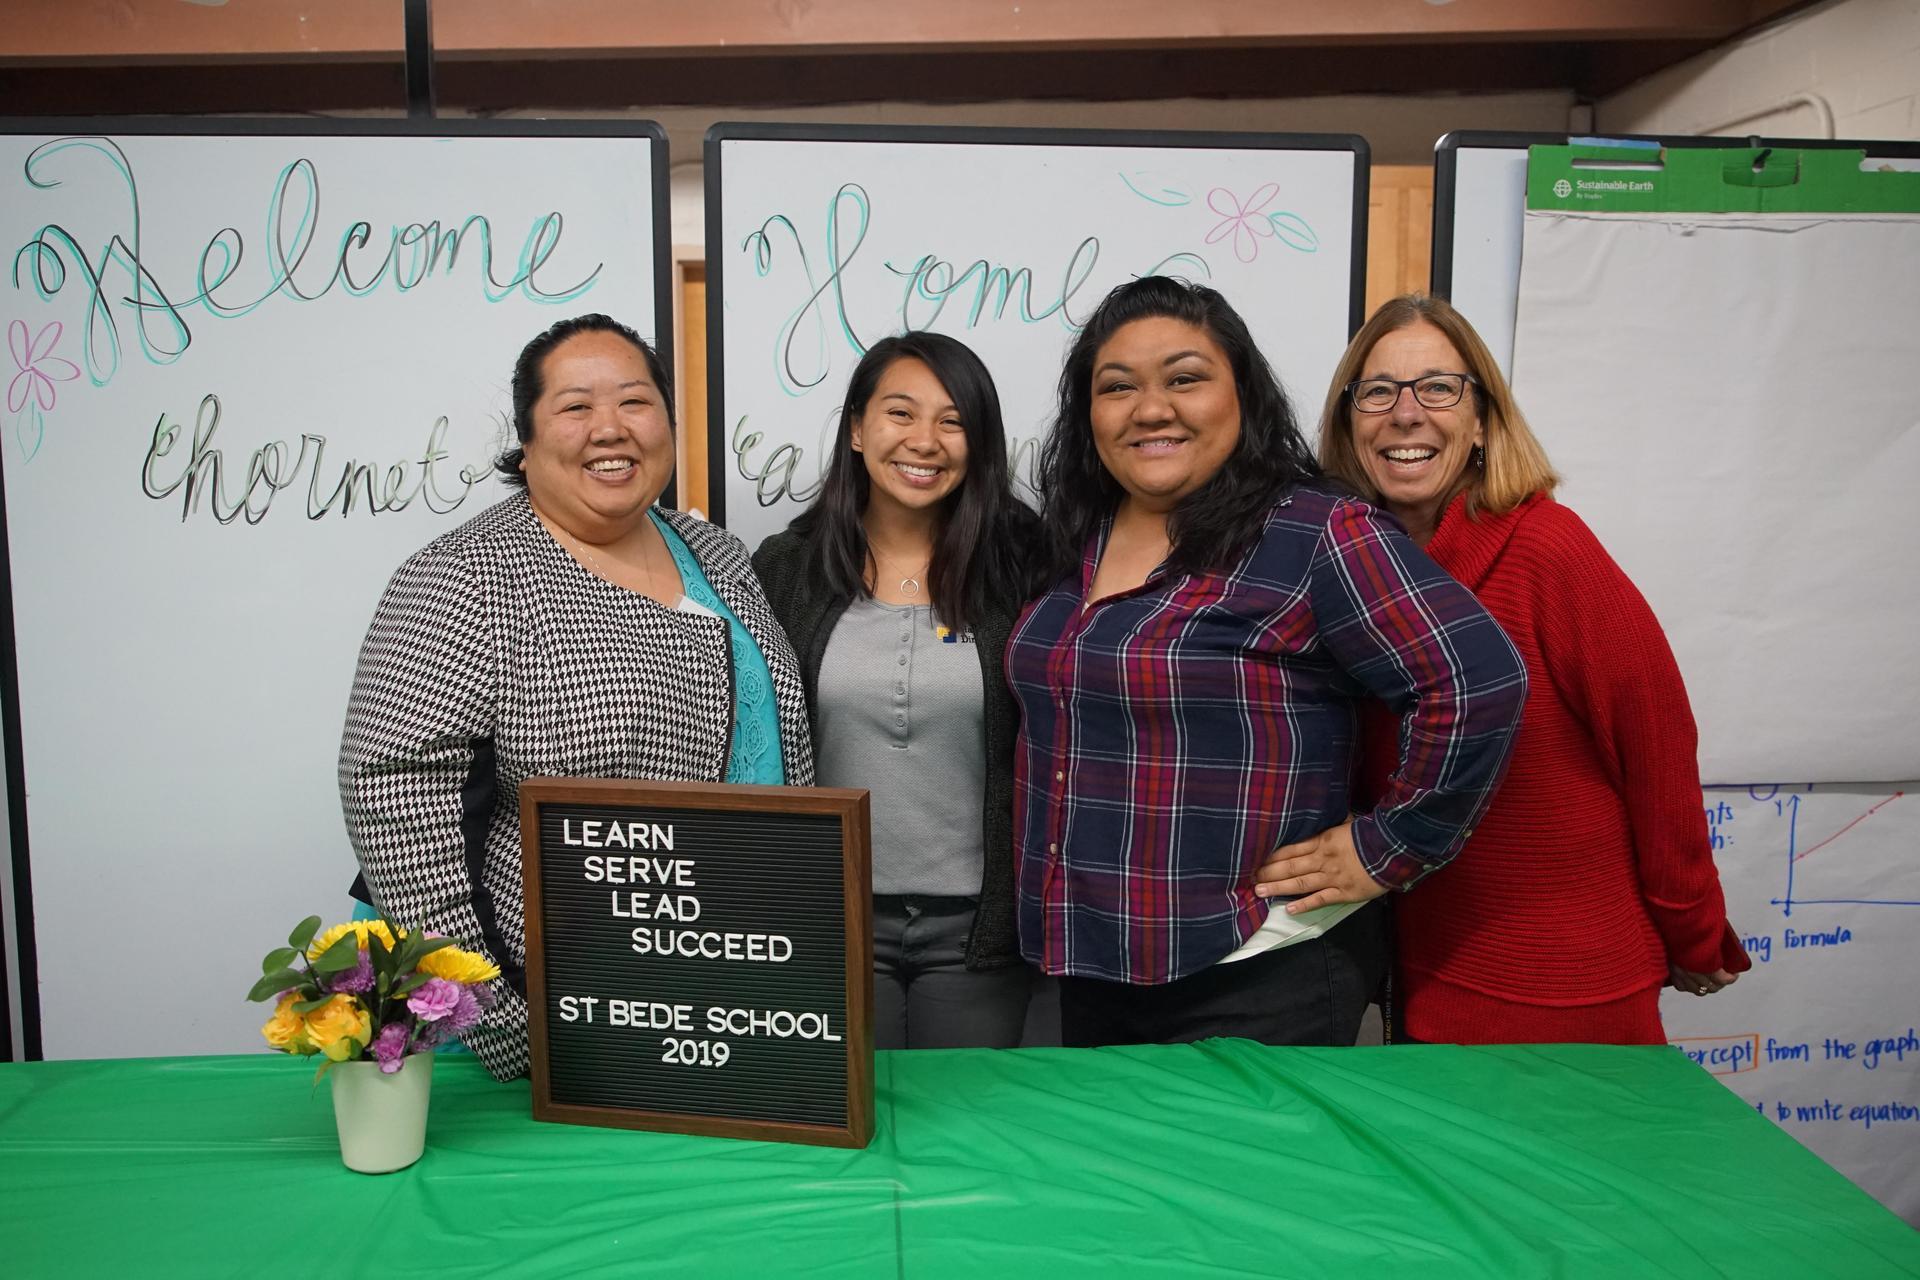 Hornet alumni with their previous art teacher, Mrs. Barton.